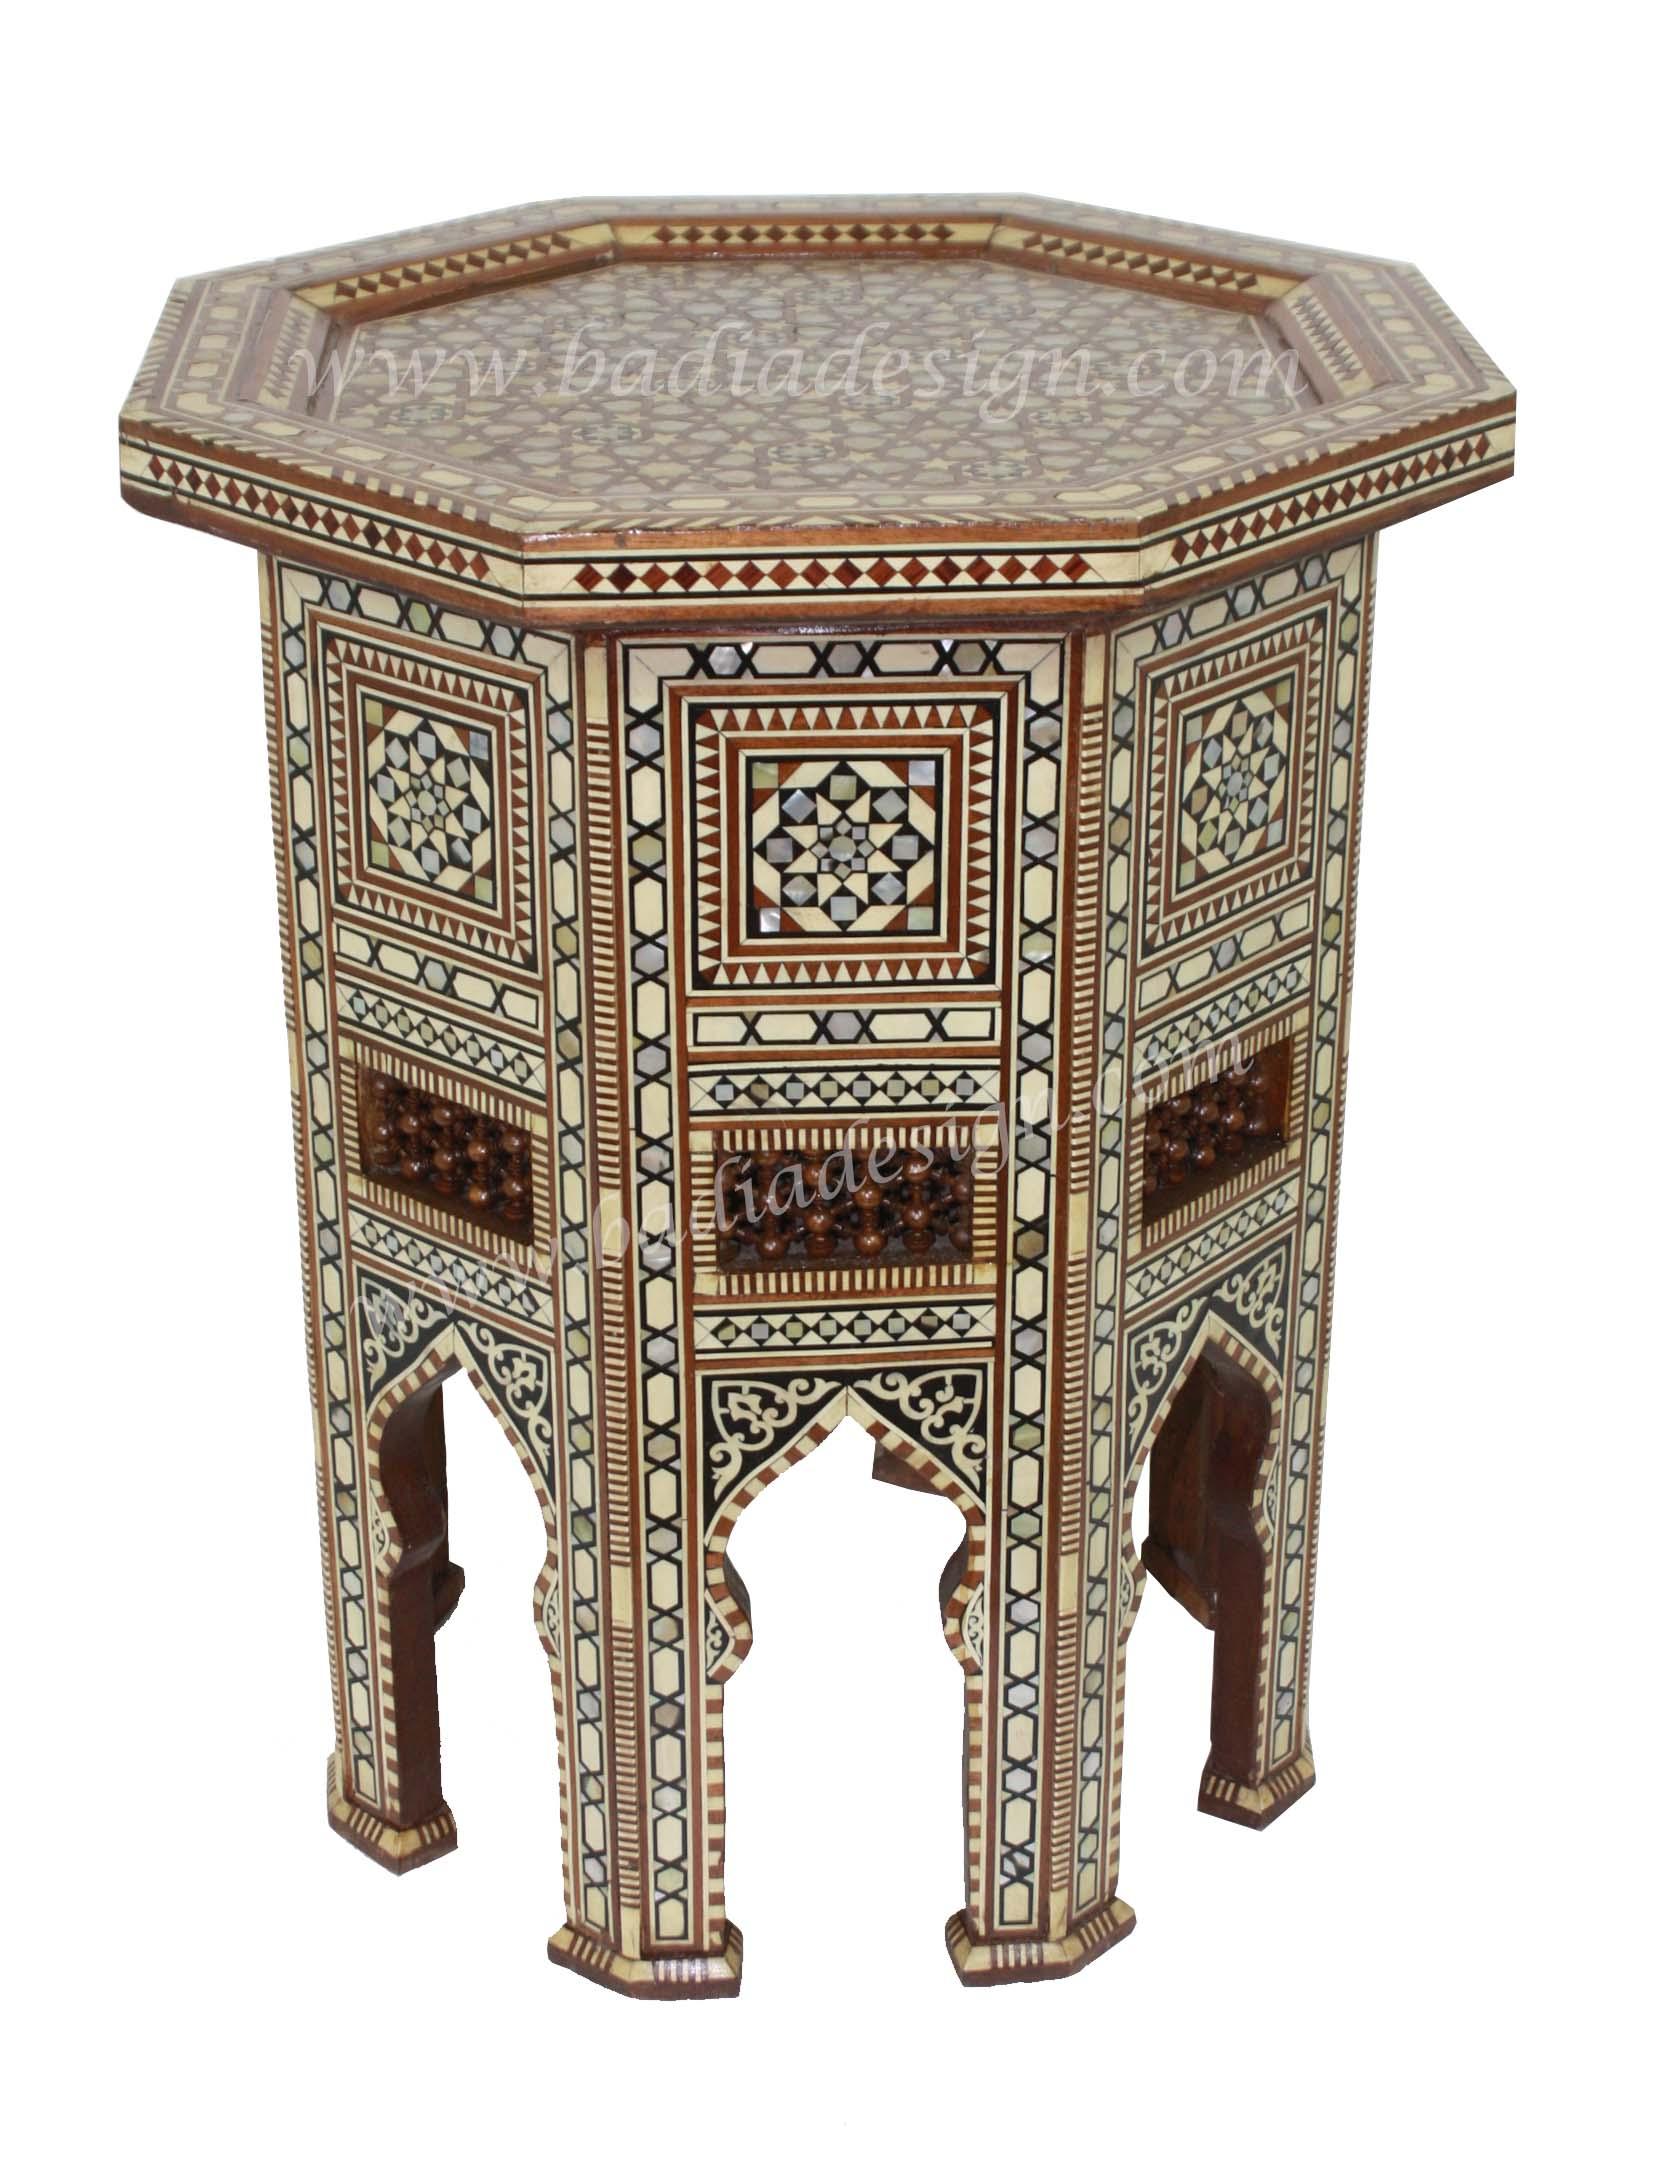 syrian-inlay-side-table-badia-design-mop-st080-1.jpg